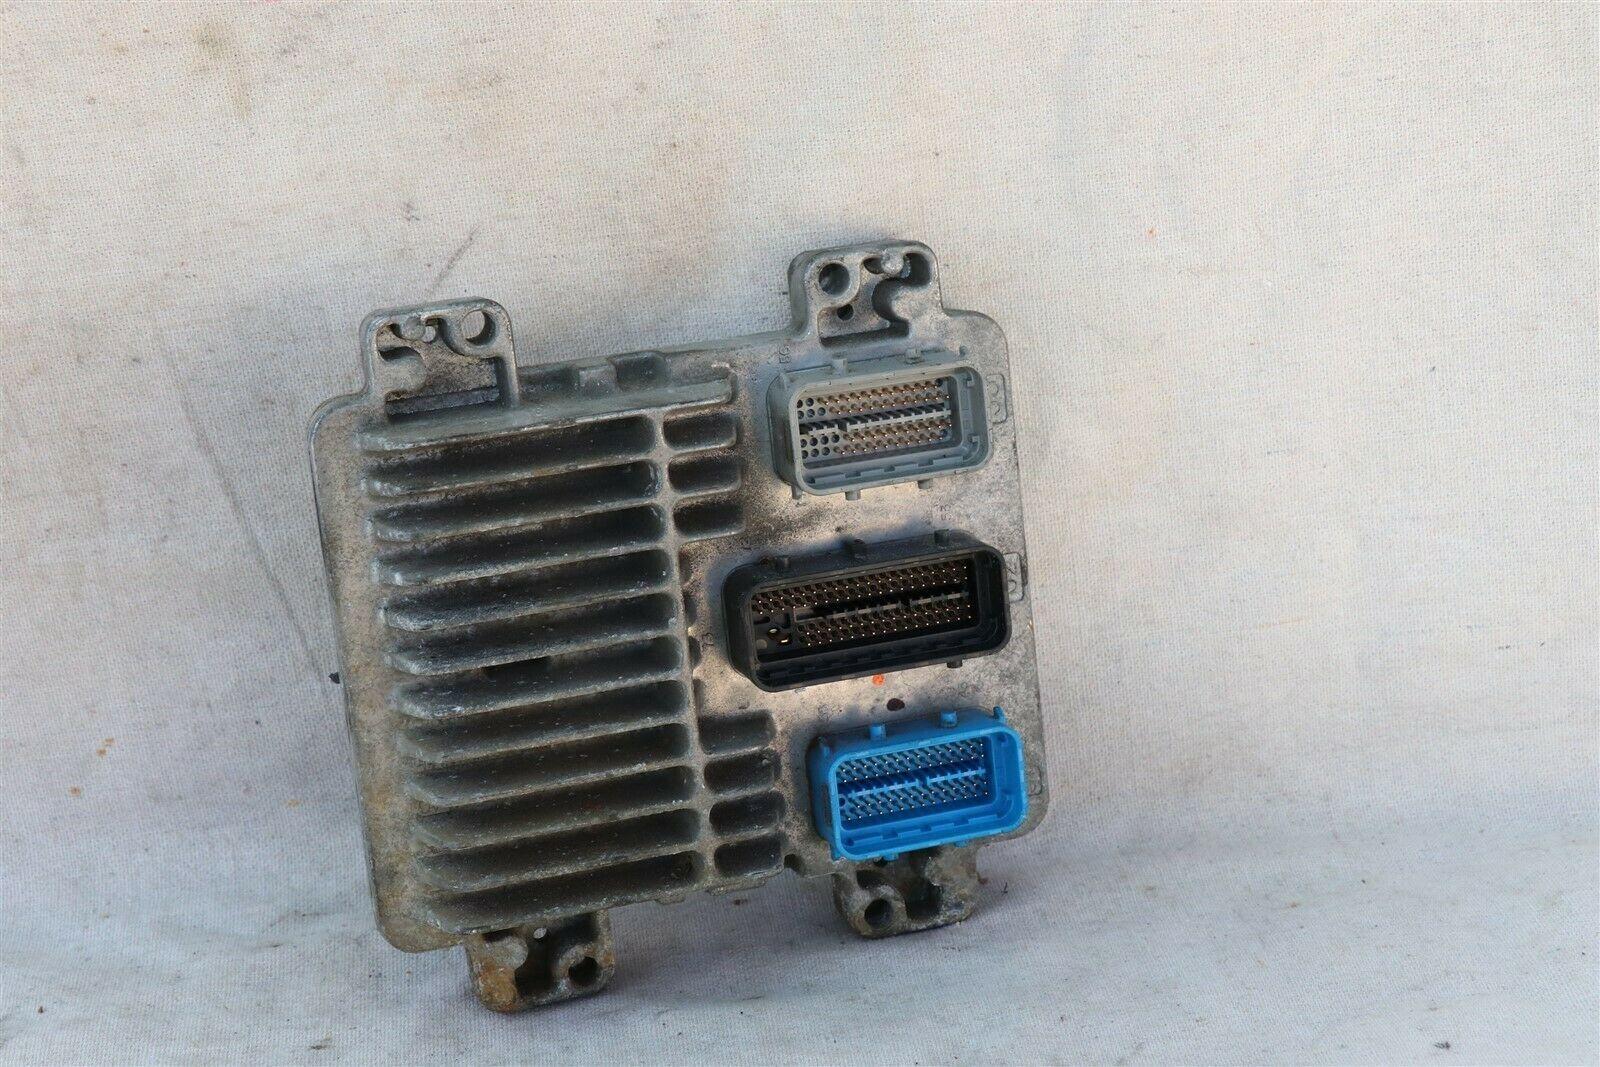 05-06 GM Envoy Trailblazer Impala SS SSR 5.3L Ecm Pcm Engine Computer 12596679